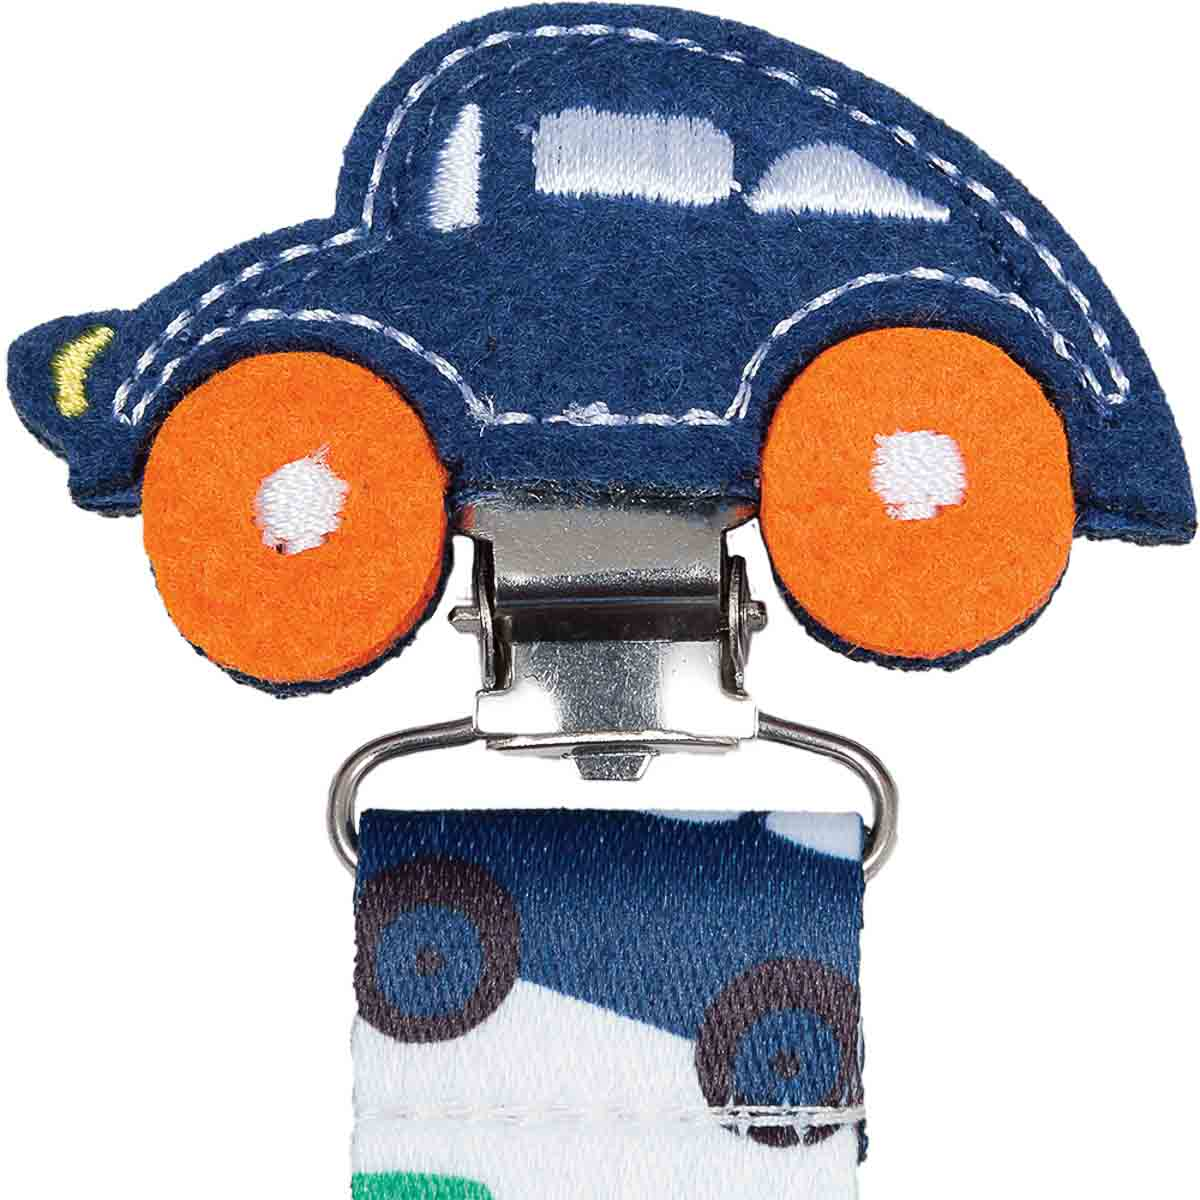 Prendedor de Chupeta Clip Metálico Carrinho - Buba